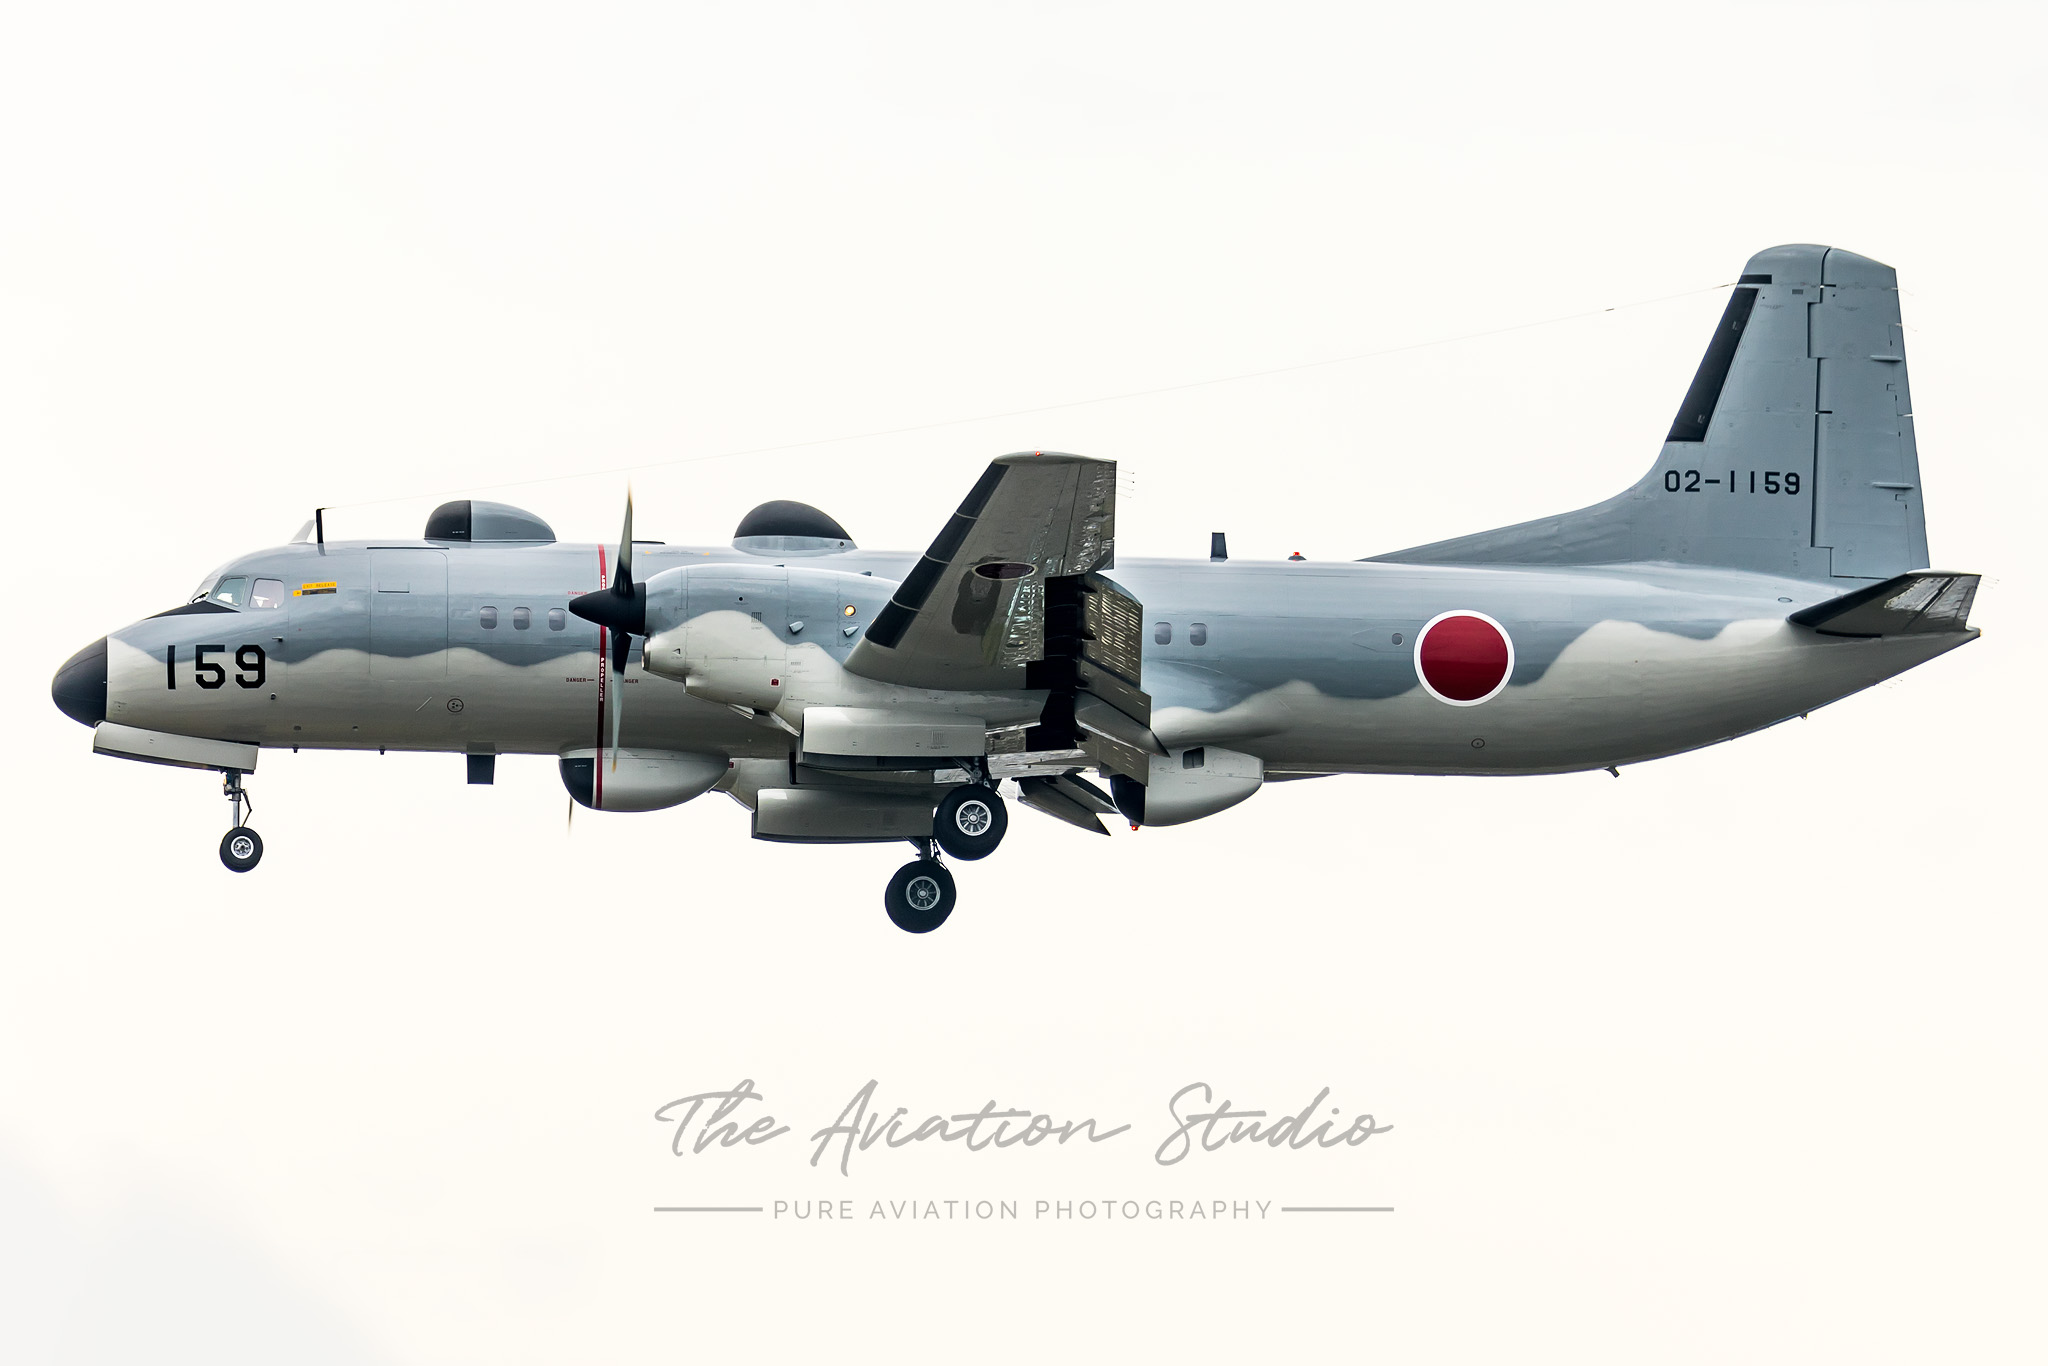 NAMC YS-11EB 02-1159 arriving at Iruma (Image: Emil Cooper)